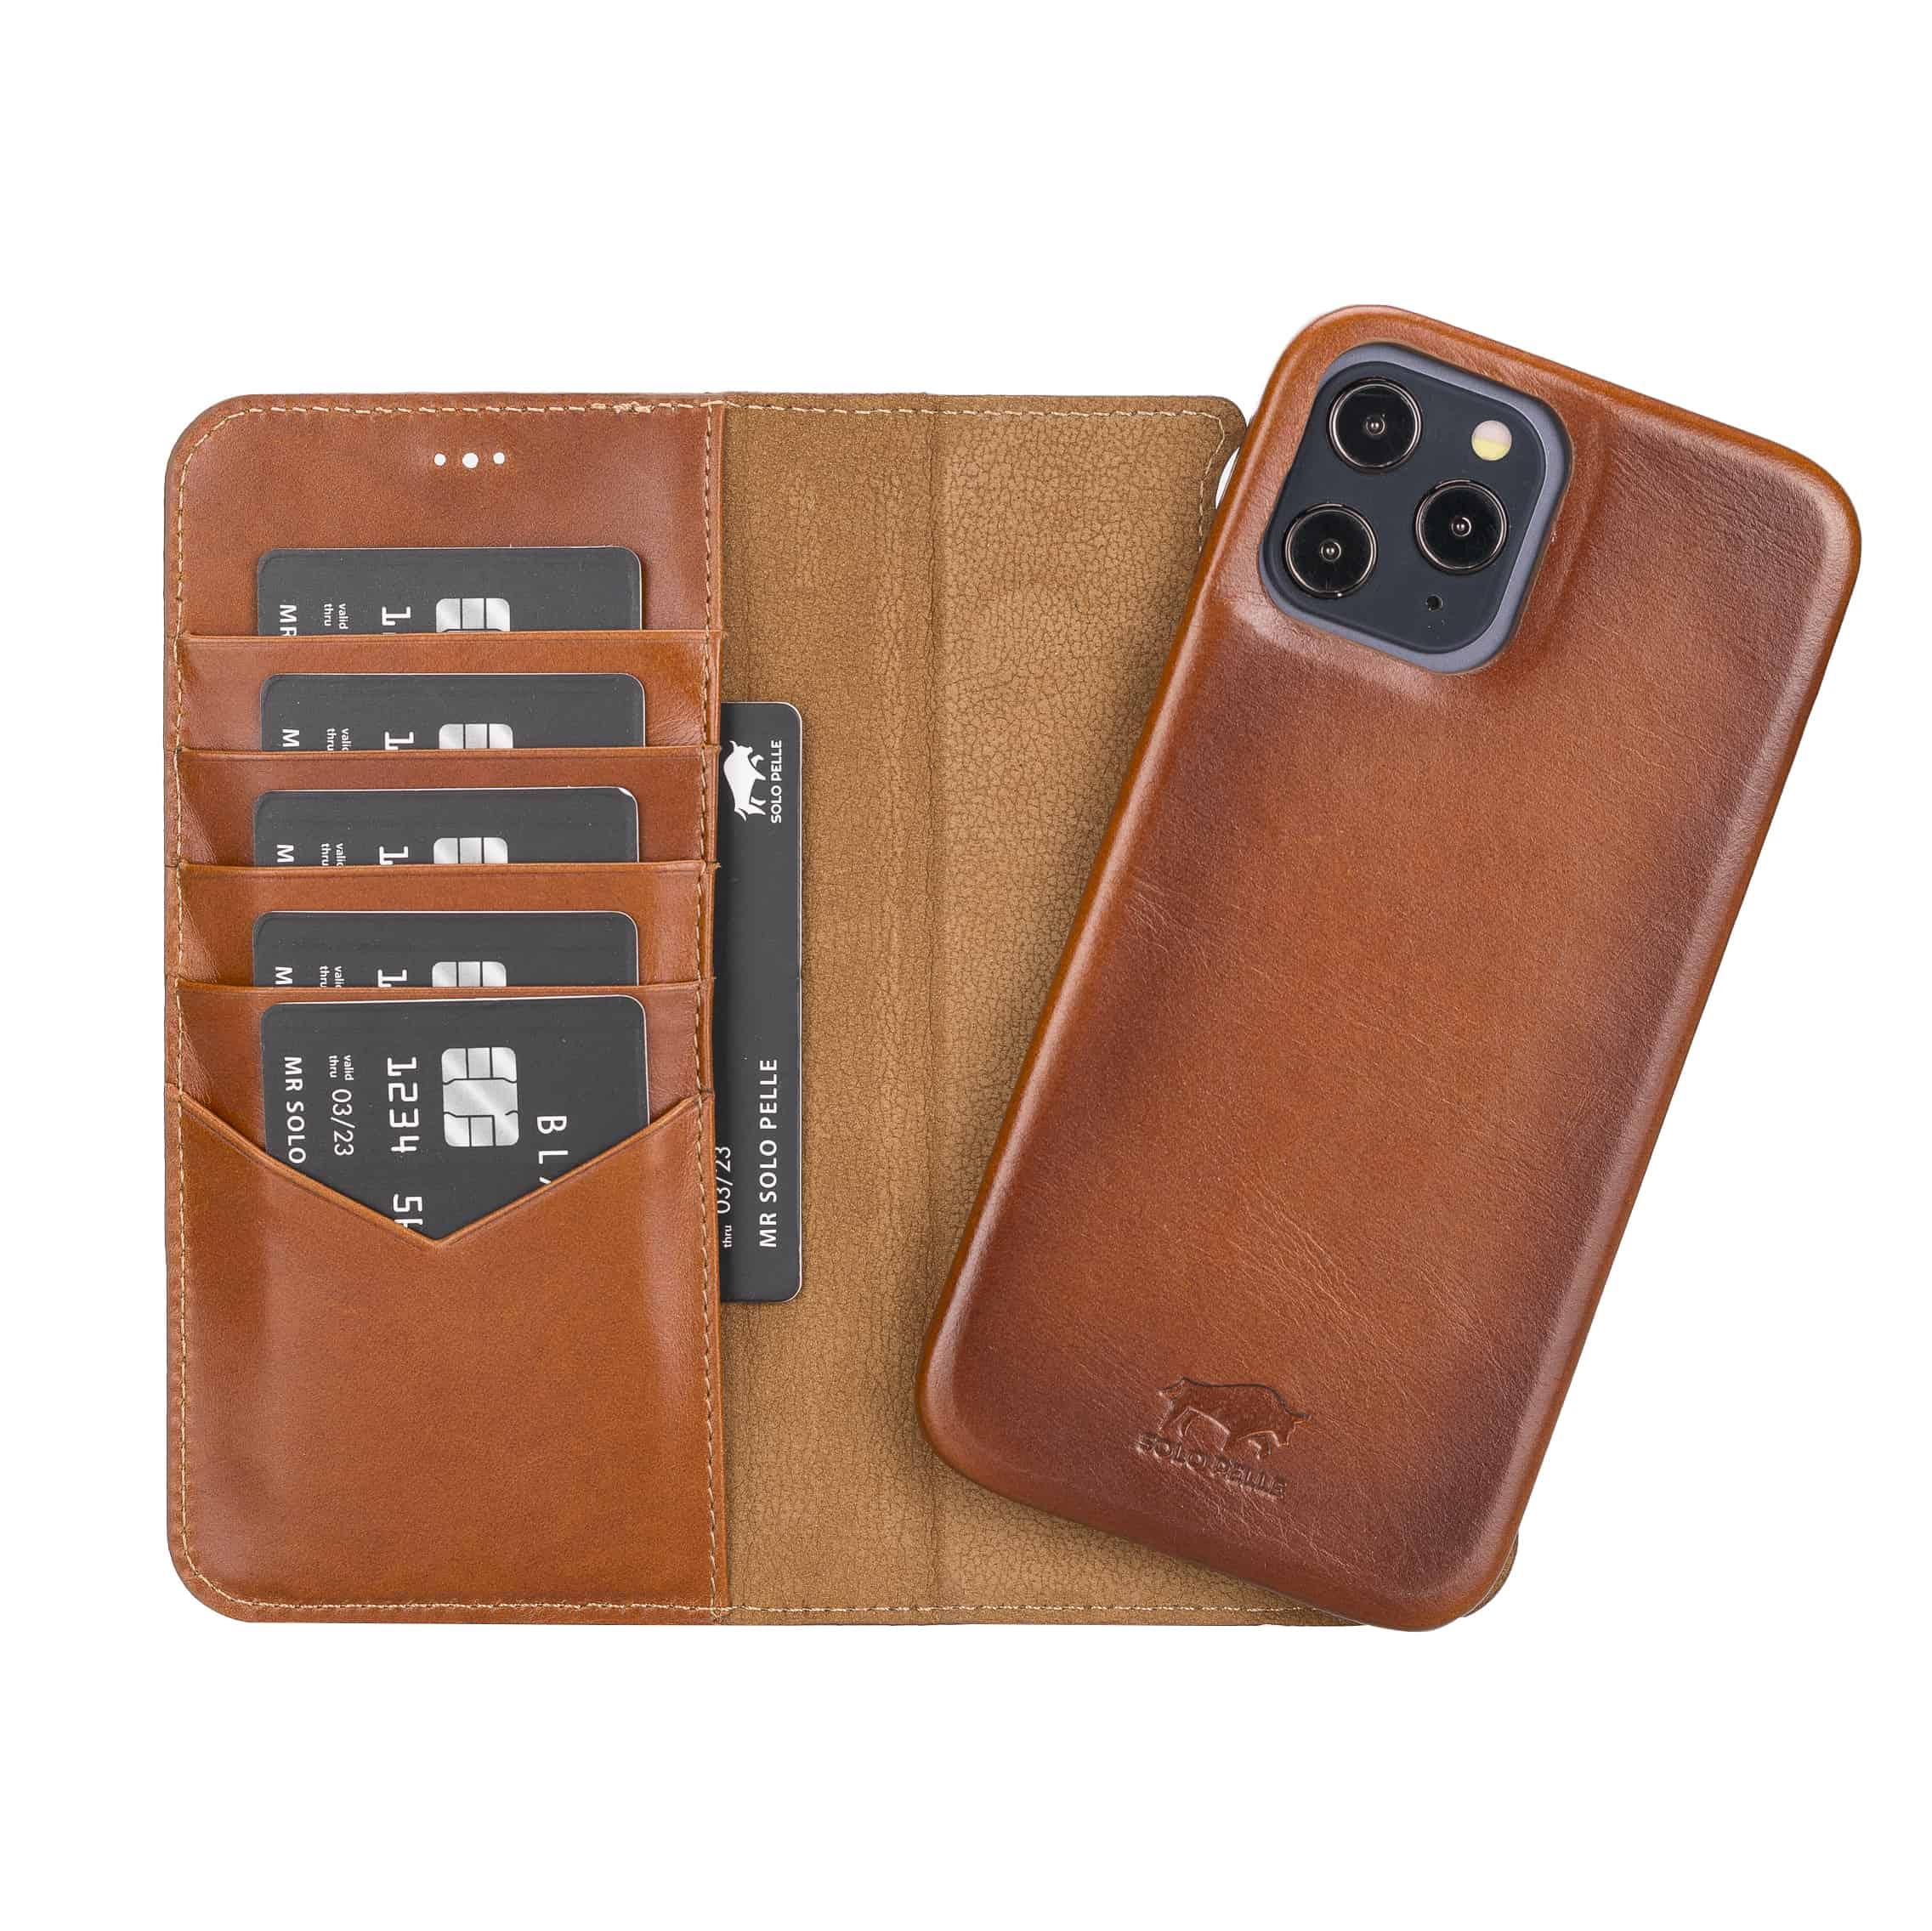 "iPhone 12 Pro Max abnehmbare Lederhülle ""Clemson"" MagSafe kompatibel (Vollleder Cognac Braun)"